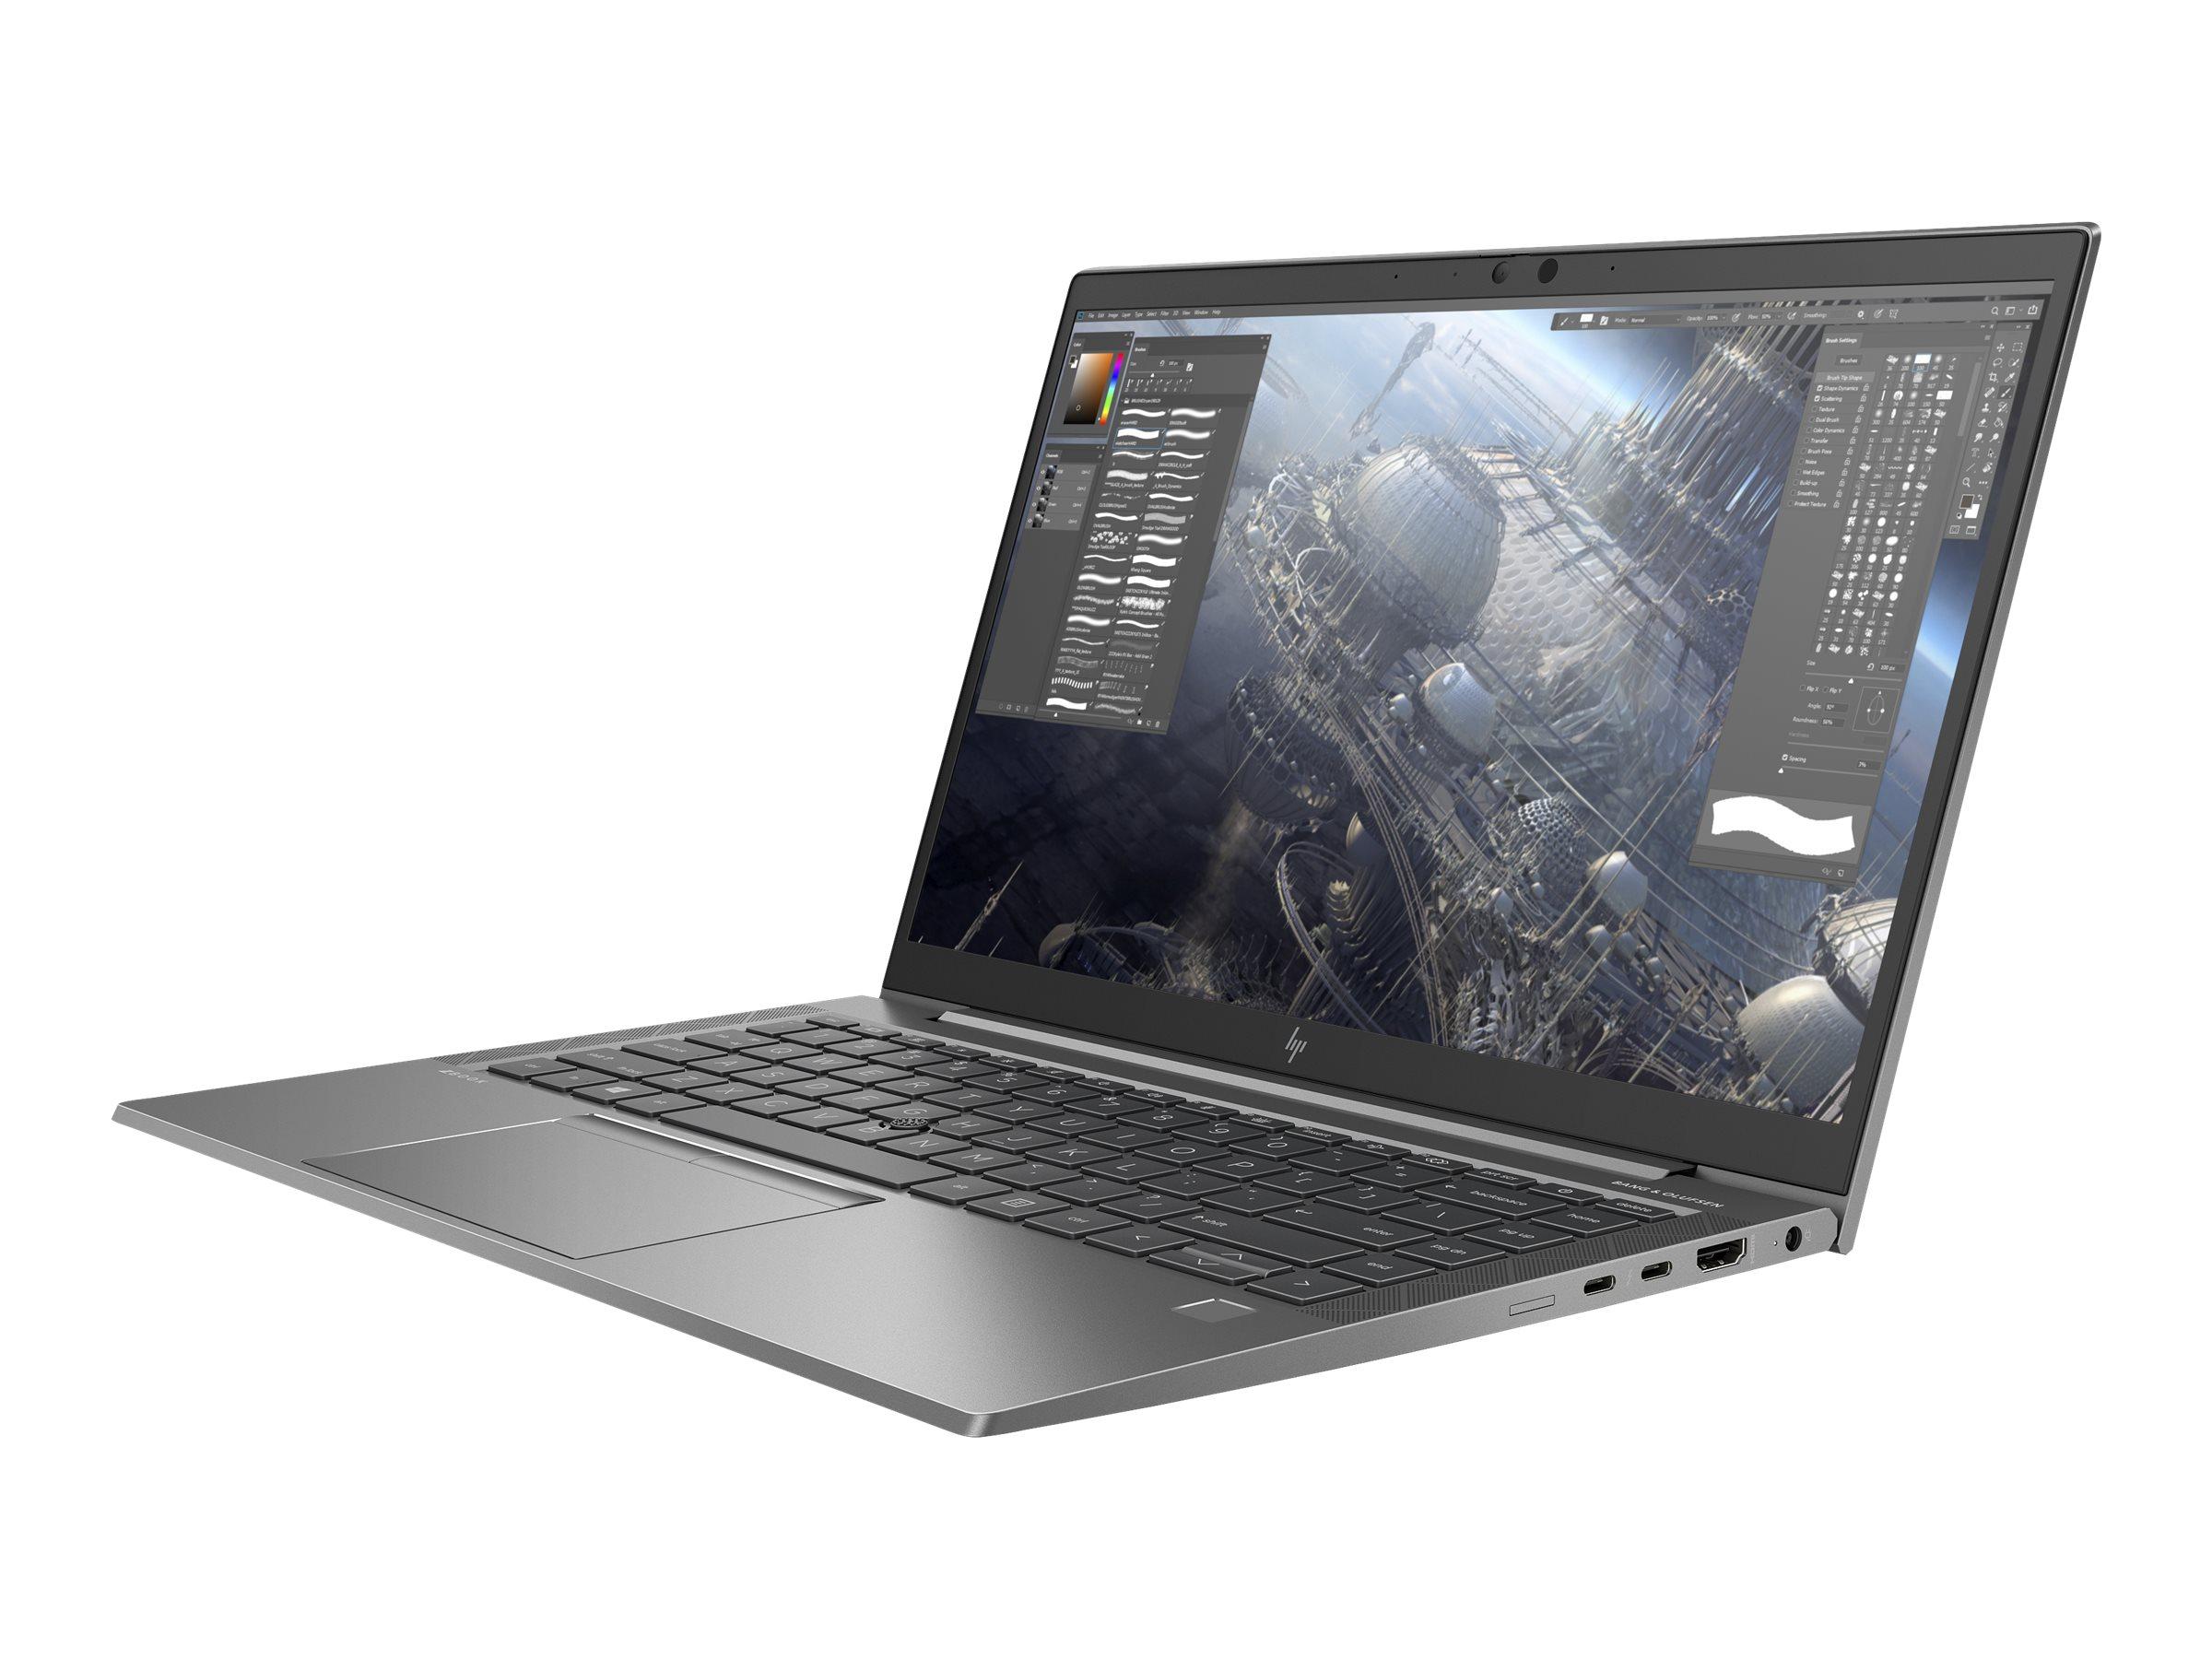 "HP ZBook Firefly 14 G8 Mobile Workstation - Core i7 1165G7 / 2.8 GHz - Win 10 Pro 64-Bit - 16 GB RAM - 1 TB SSD NVMe, TLC - 35.6 cm (14"")"